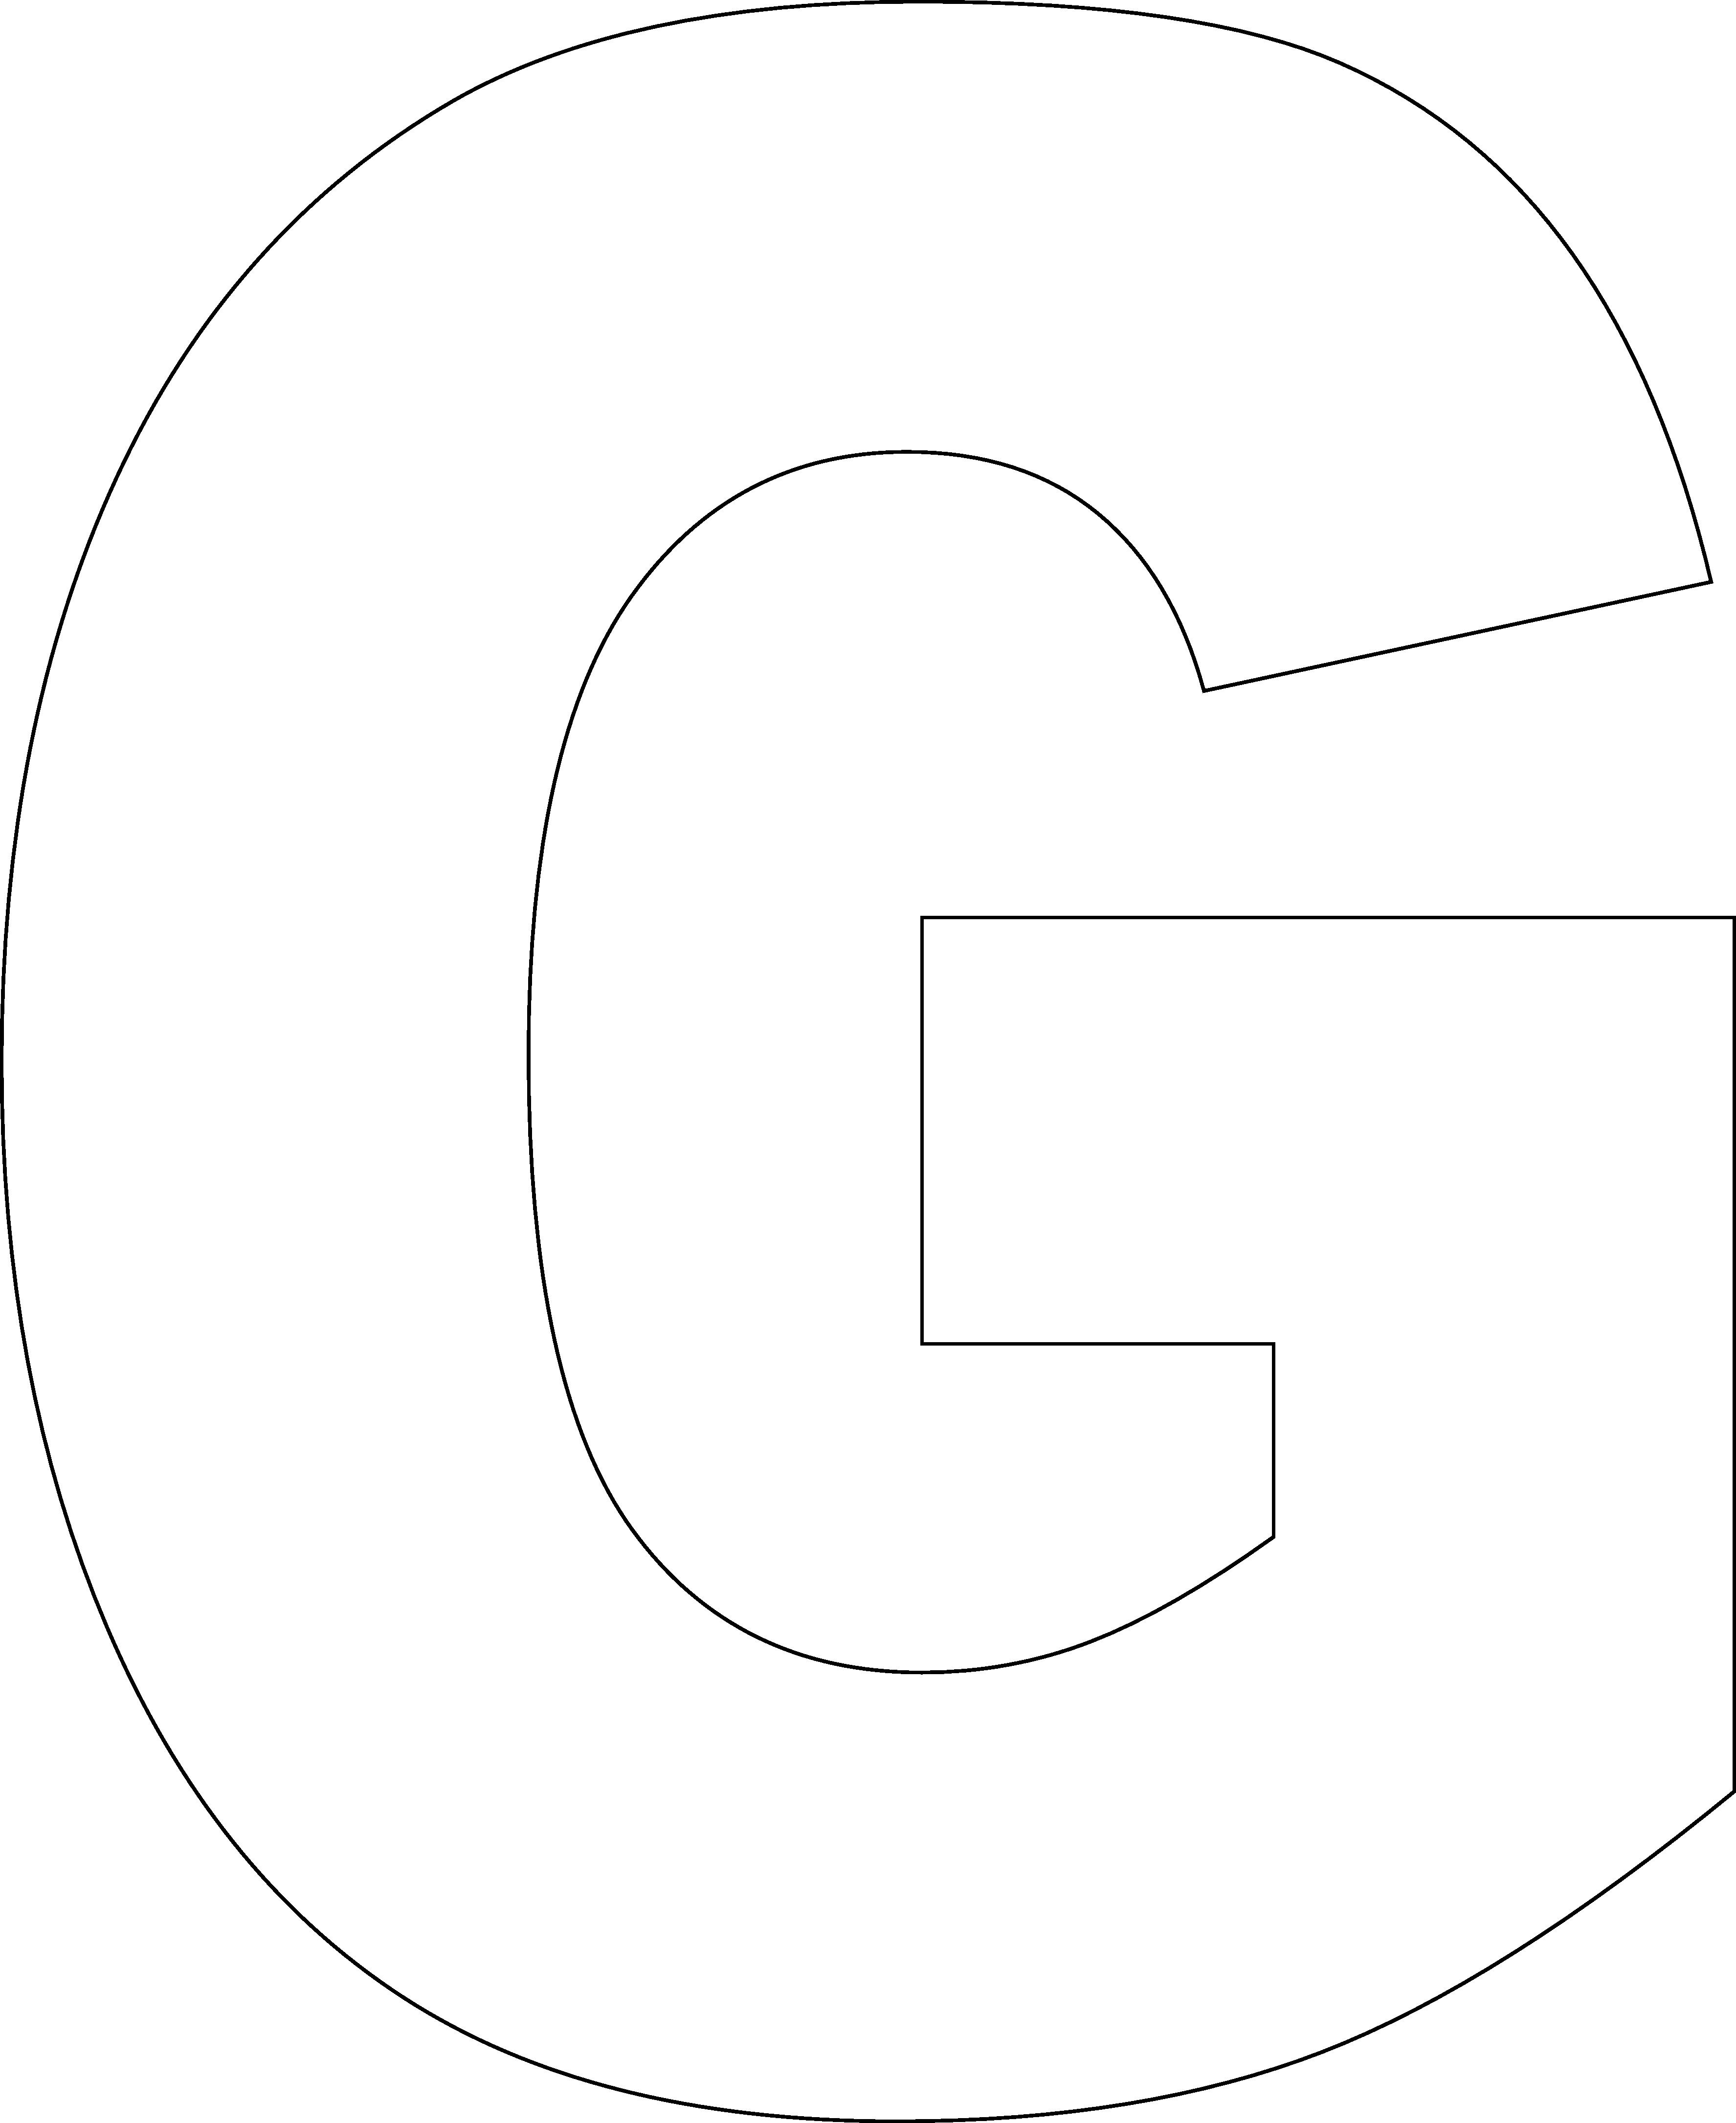 Lettergprintabletemplates large printable pinterest large printable alphabet letters g free printable large alphabet letter templates letter g cut out large printable spiritdancerdesigns Image collections